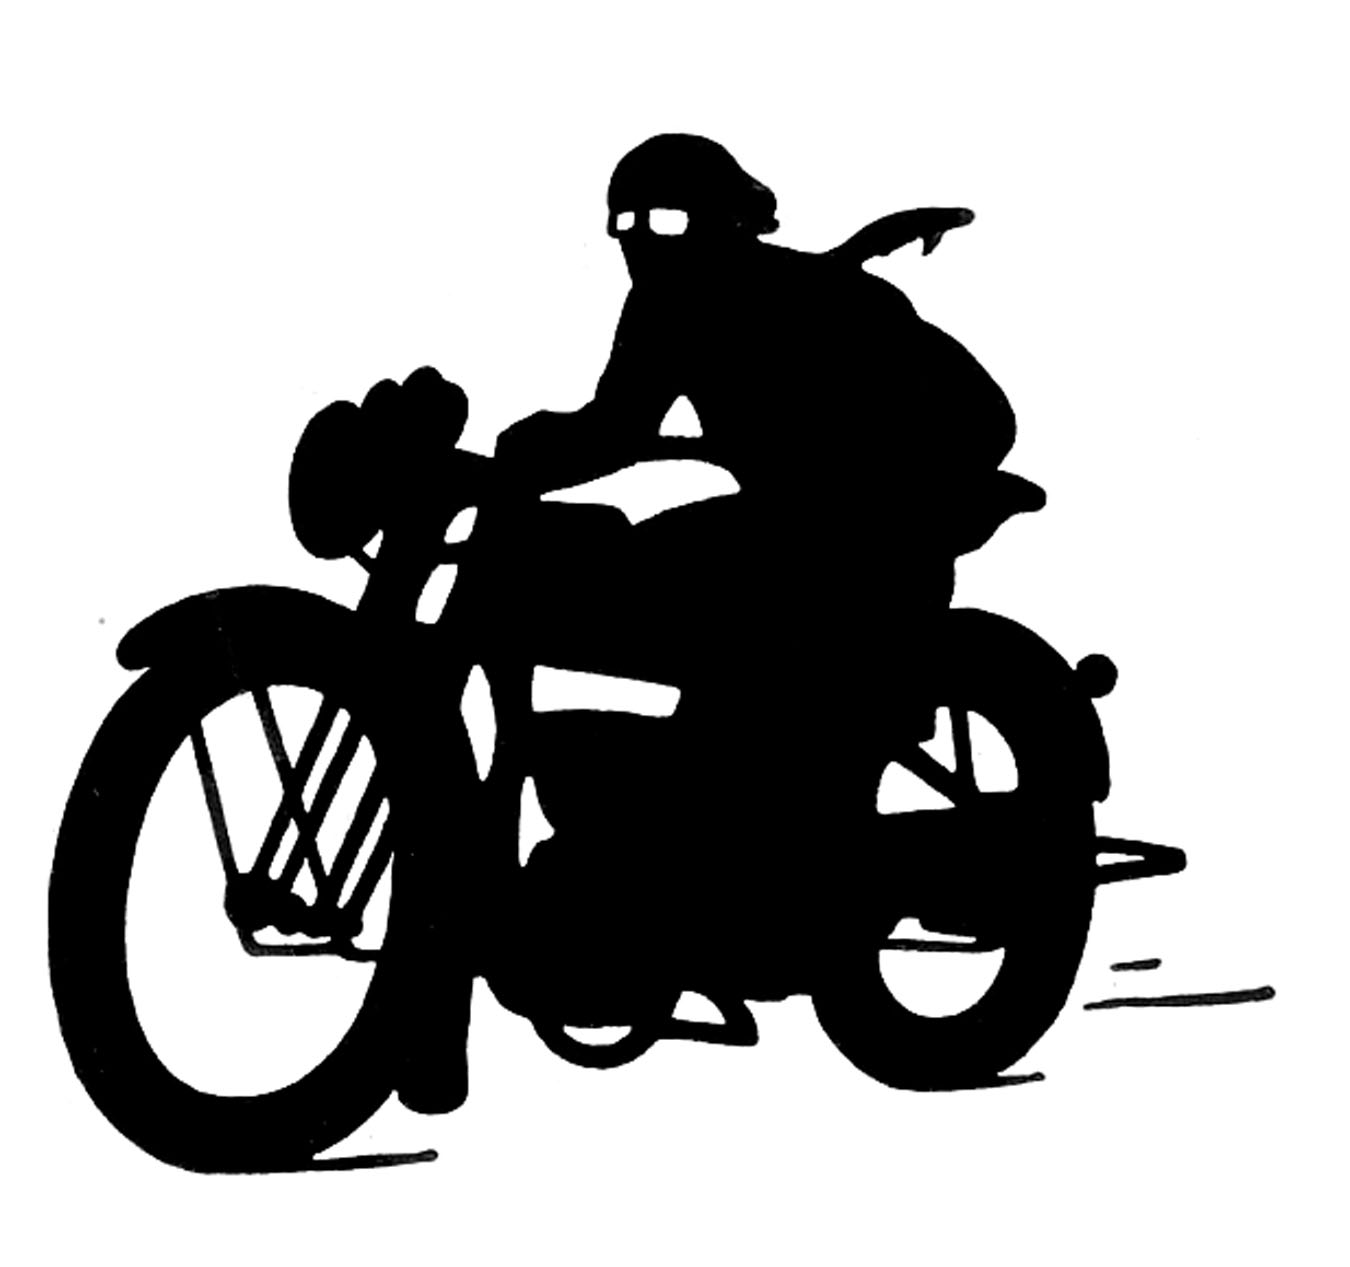 Vintage Motorcycle Silhouette